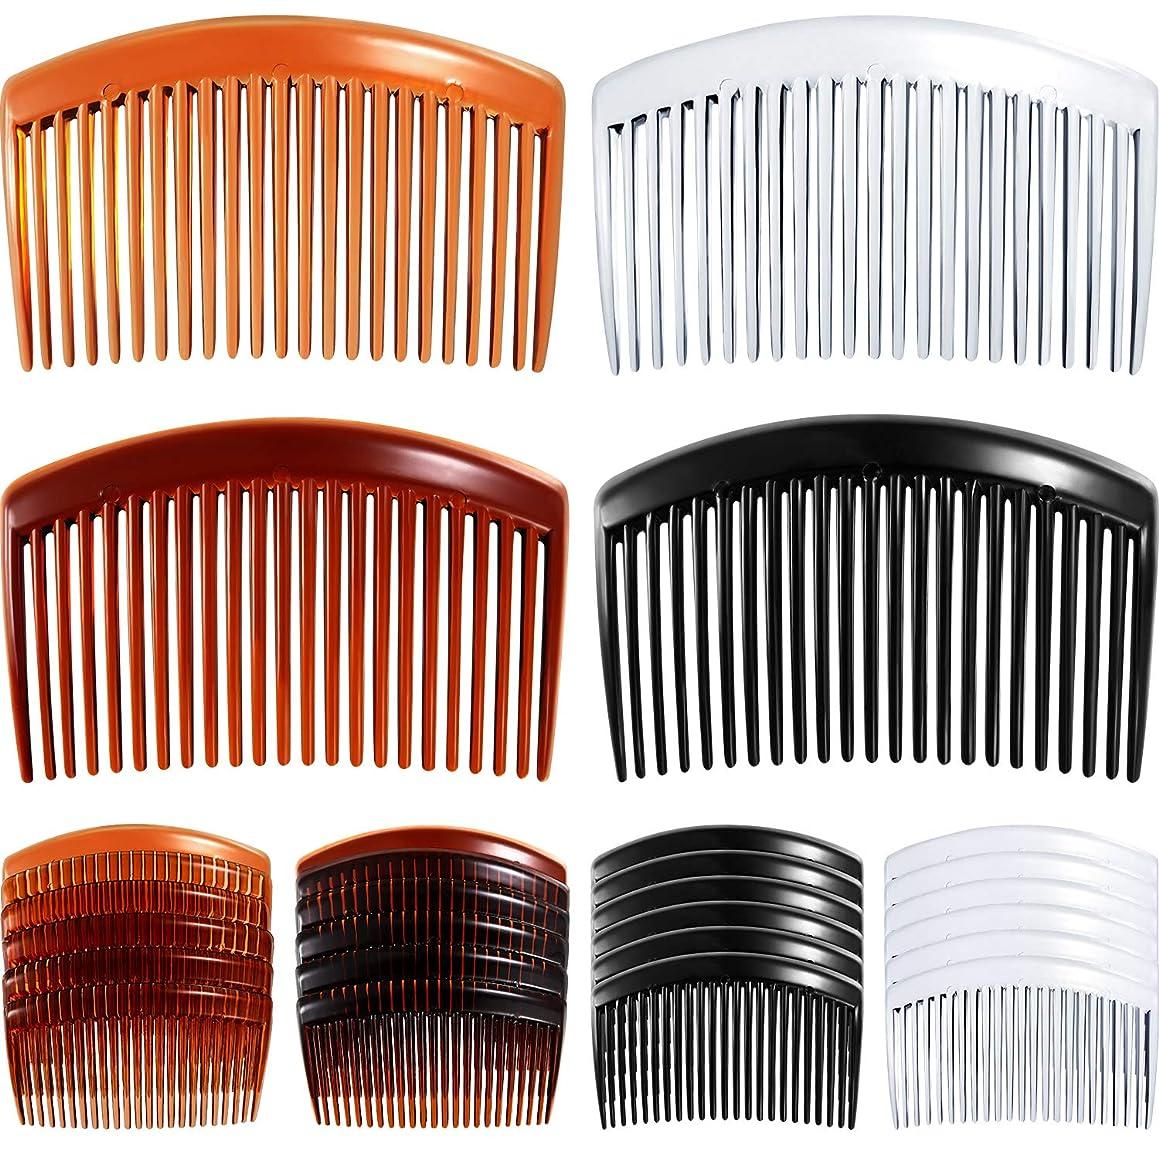 24 Pieces Hair Comb Plastic Hair Side Combs Straight Teeth Hair Clip Comb Bridal Wedding Veil Comb for Fine Hair